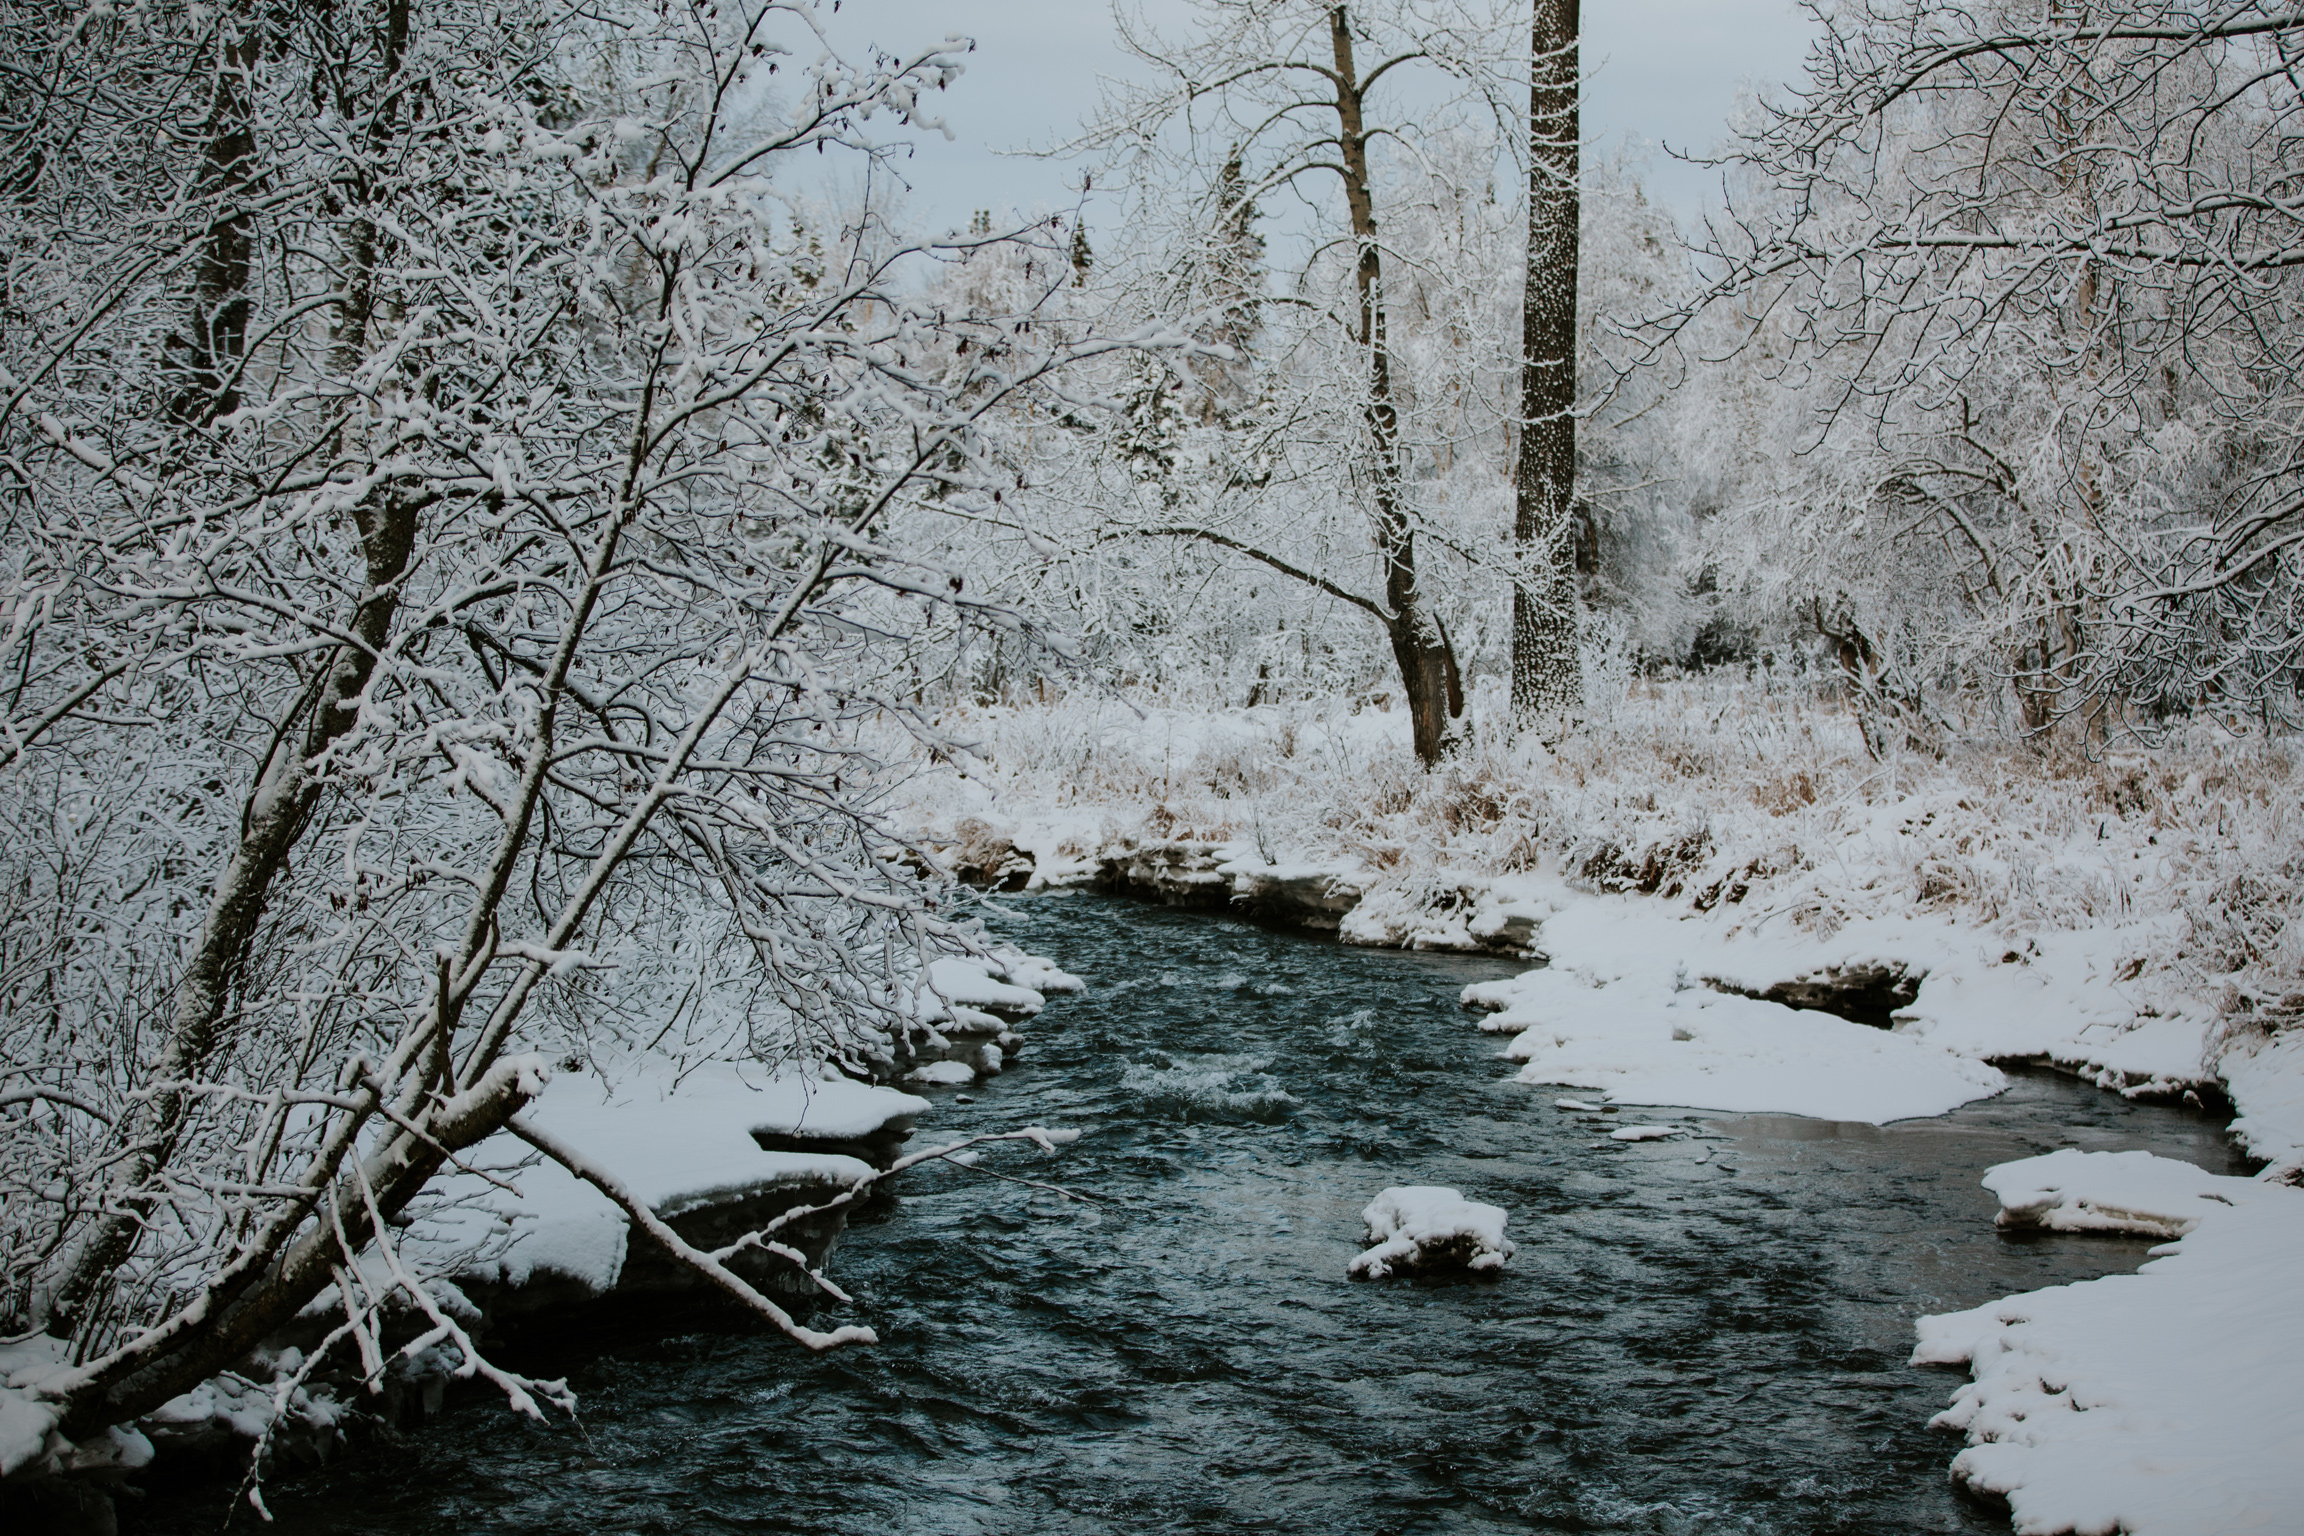 CindyGiovagnoli_Alaska_Anchorage_CampbellTract_Bicentennial_Park_winter_snow-002.jpg